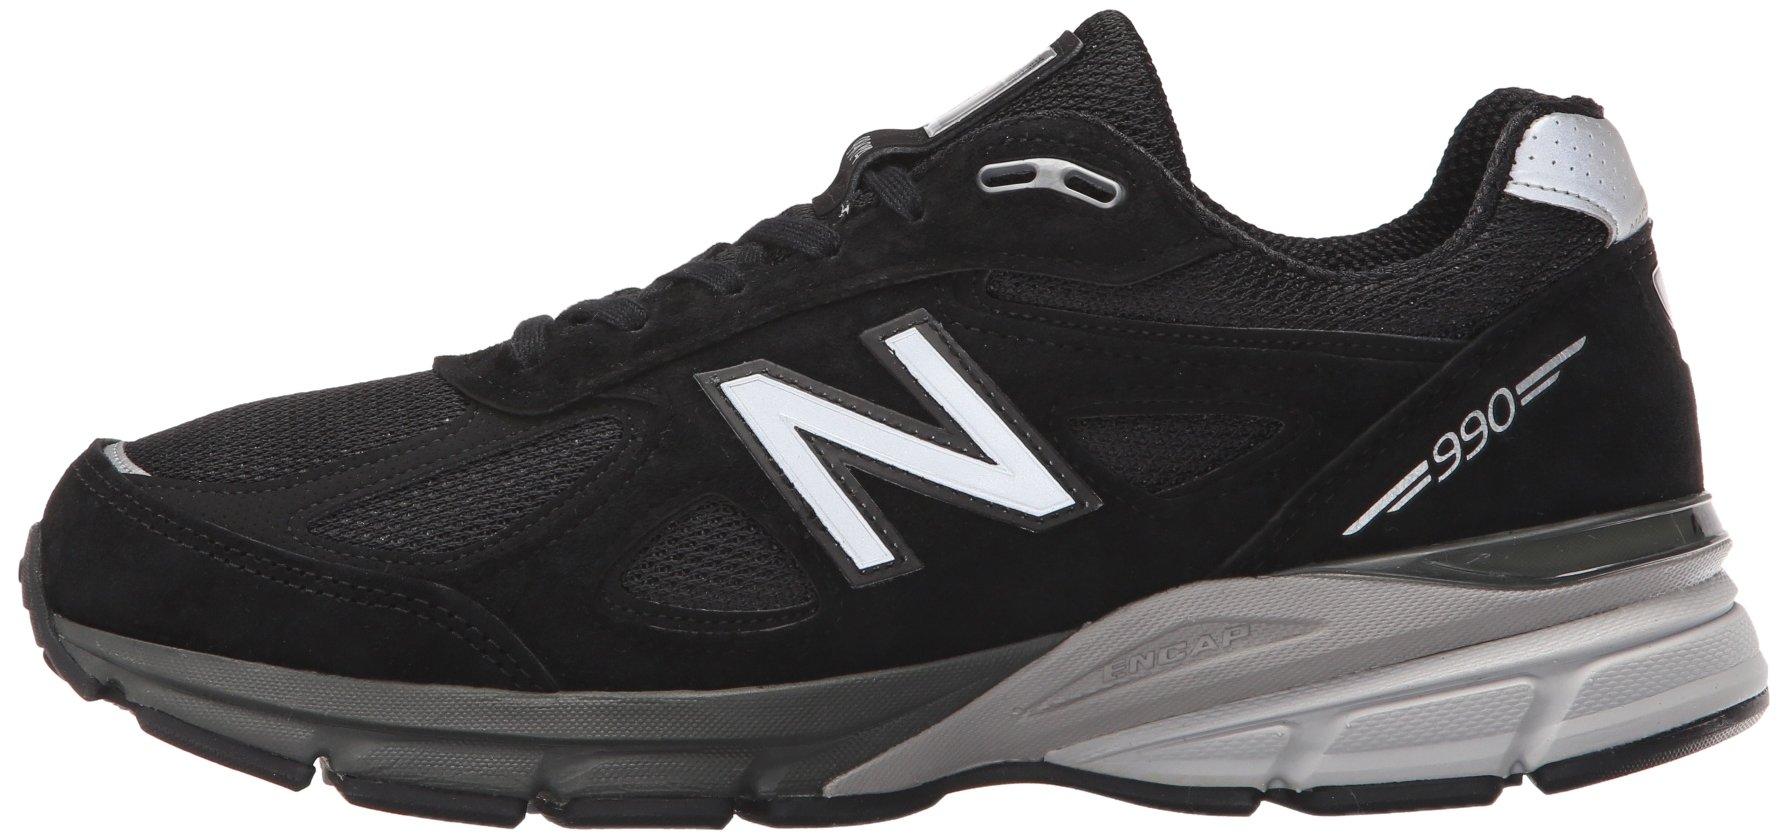 71ty91MZi4L - New Balance Mens M990 990v4 Black Size: 7.5 Wide